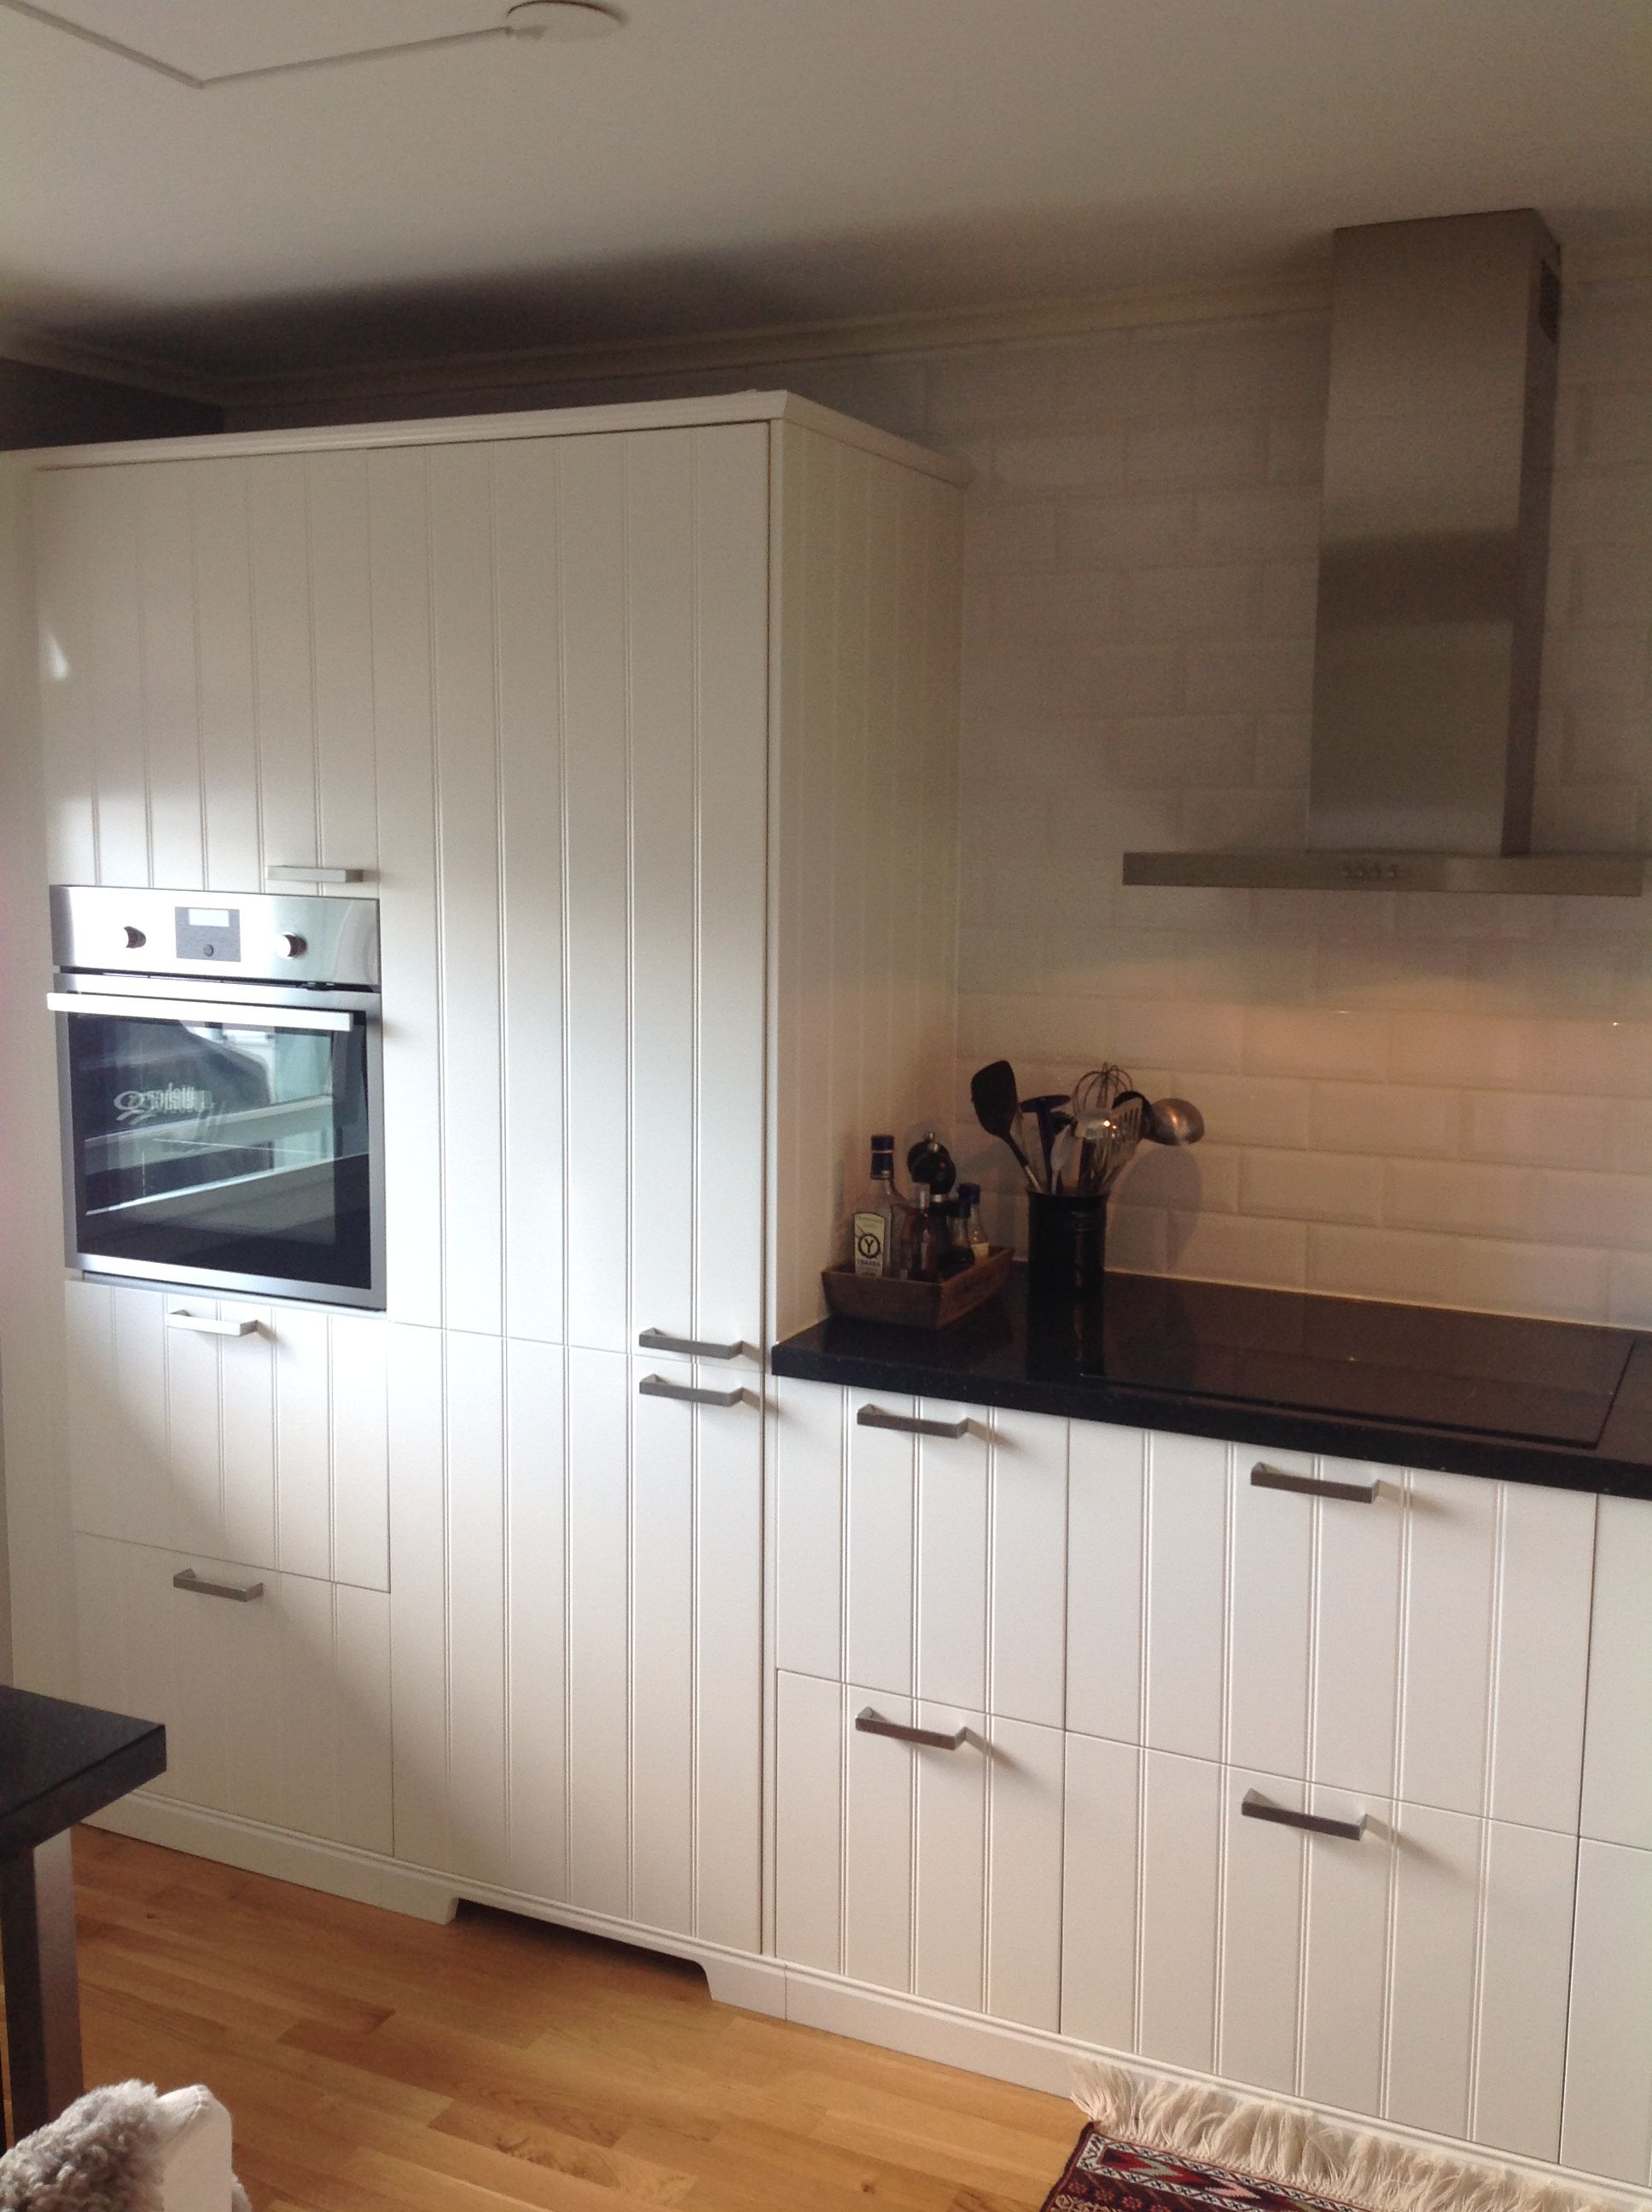 Ikea Hittarp kitchen | country | Pinterest | Cocina ikea, Cocinas y Ikea